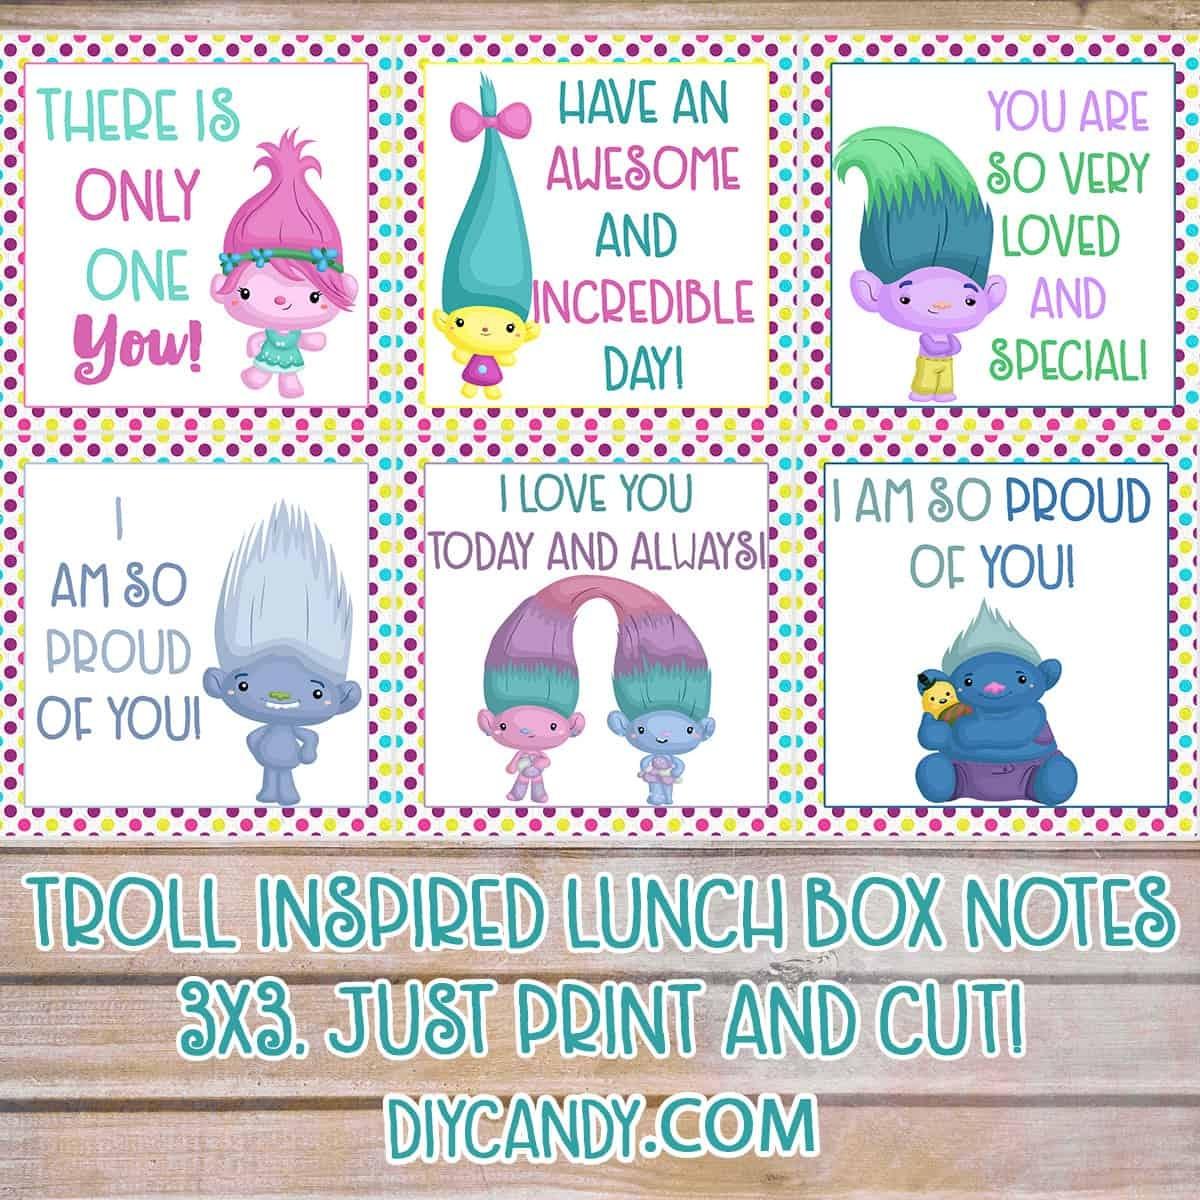 Free Trolls Printables: Lunchbox Notes - Diy Candy - Free Printable Trolls